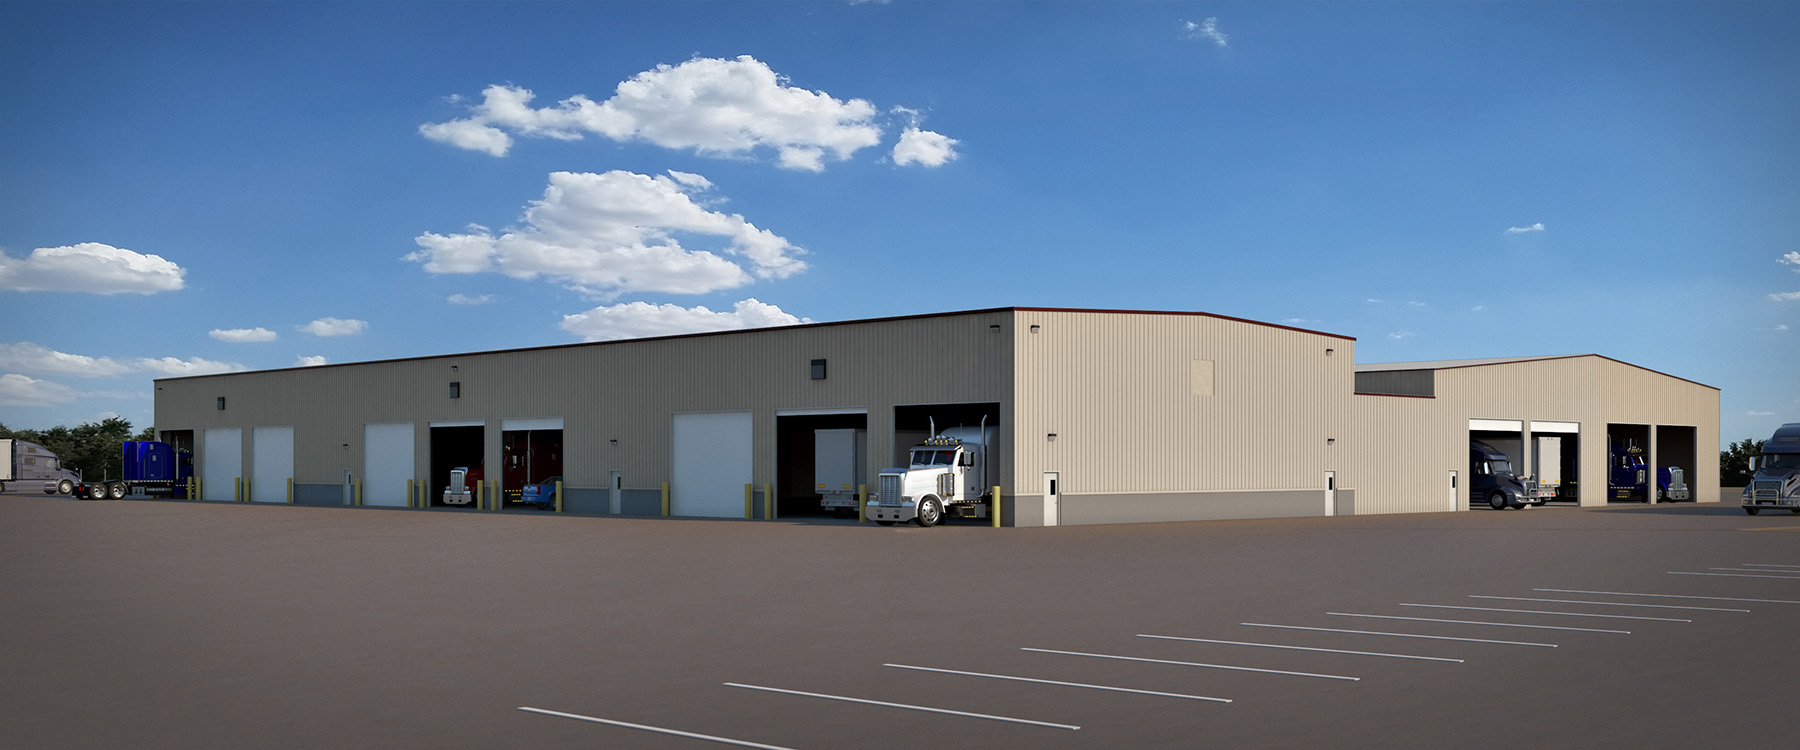 Trailer Repair Facility, industrial building in Phoenix